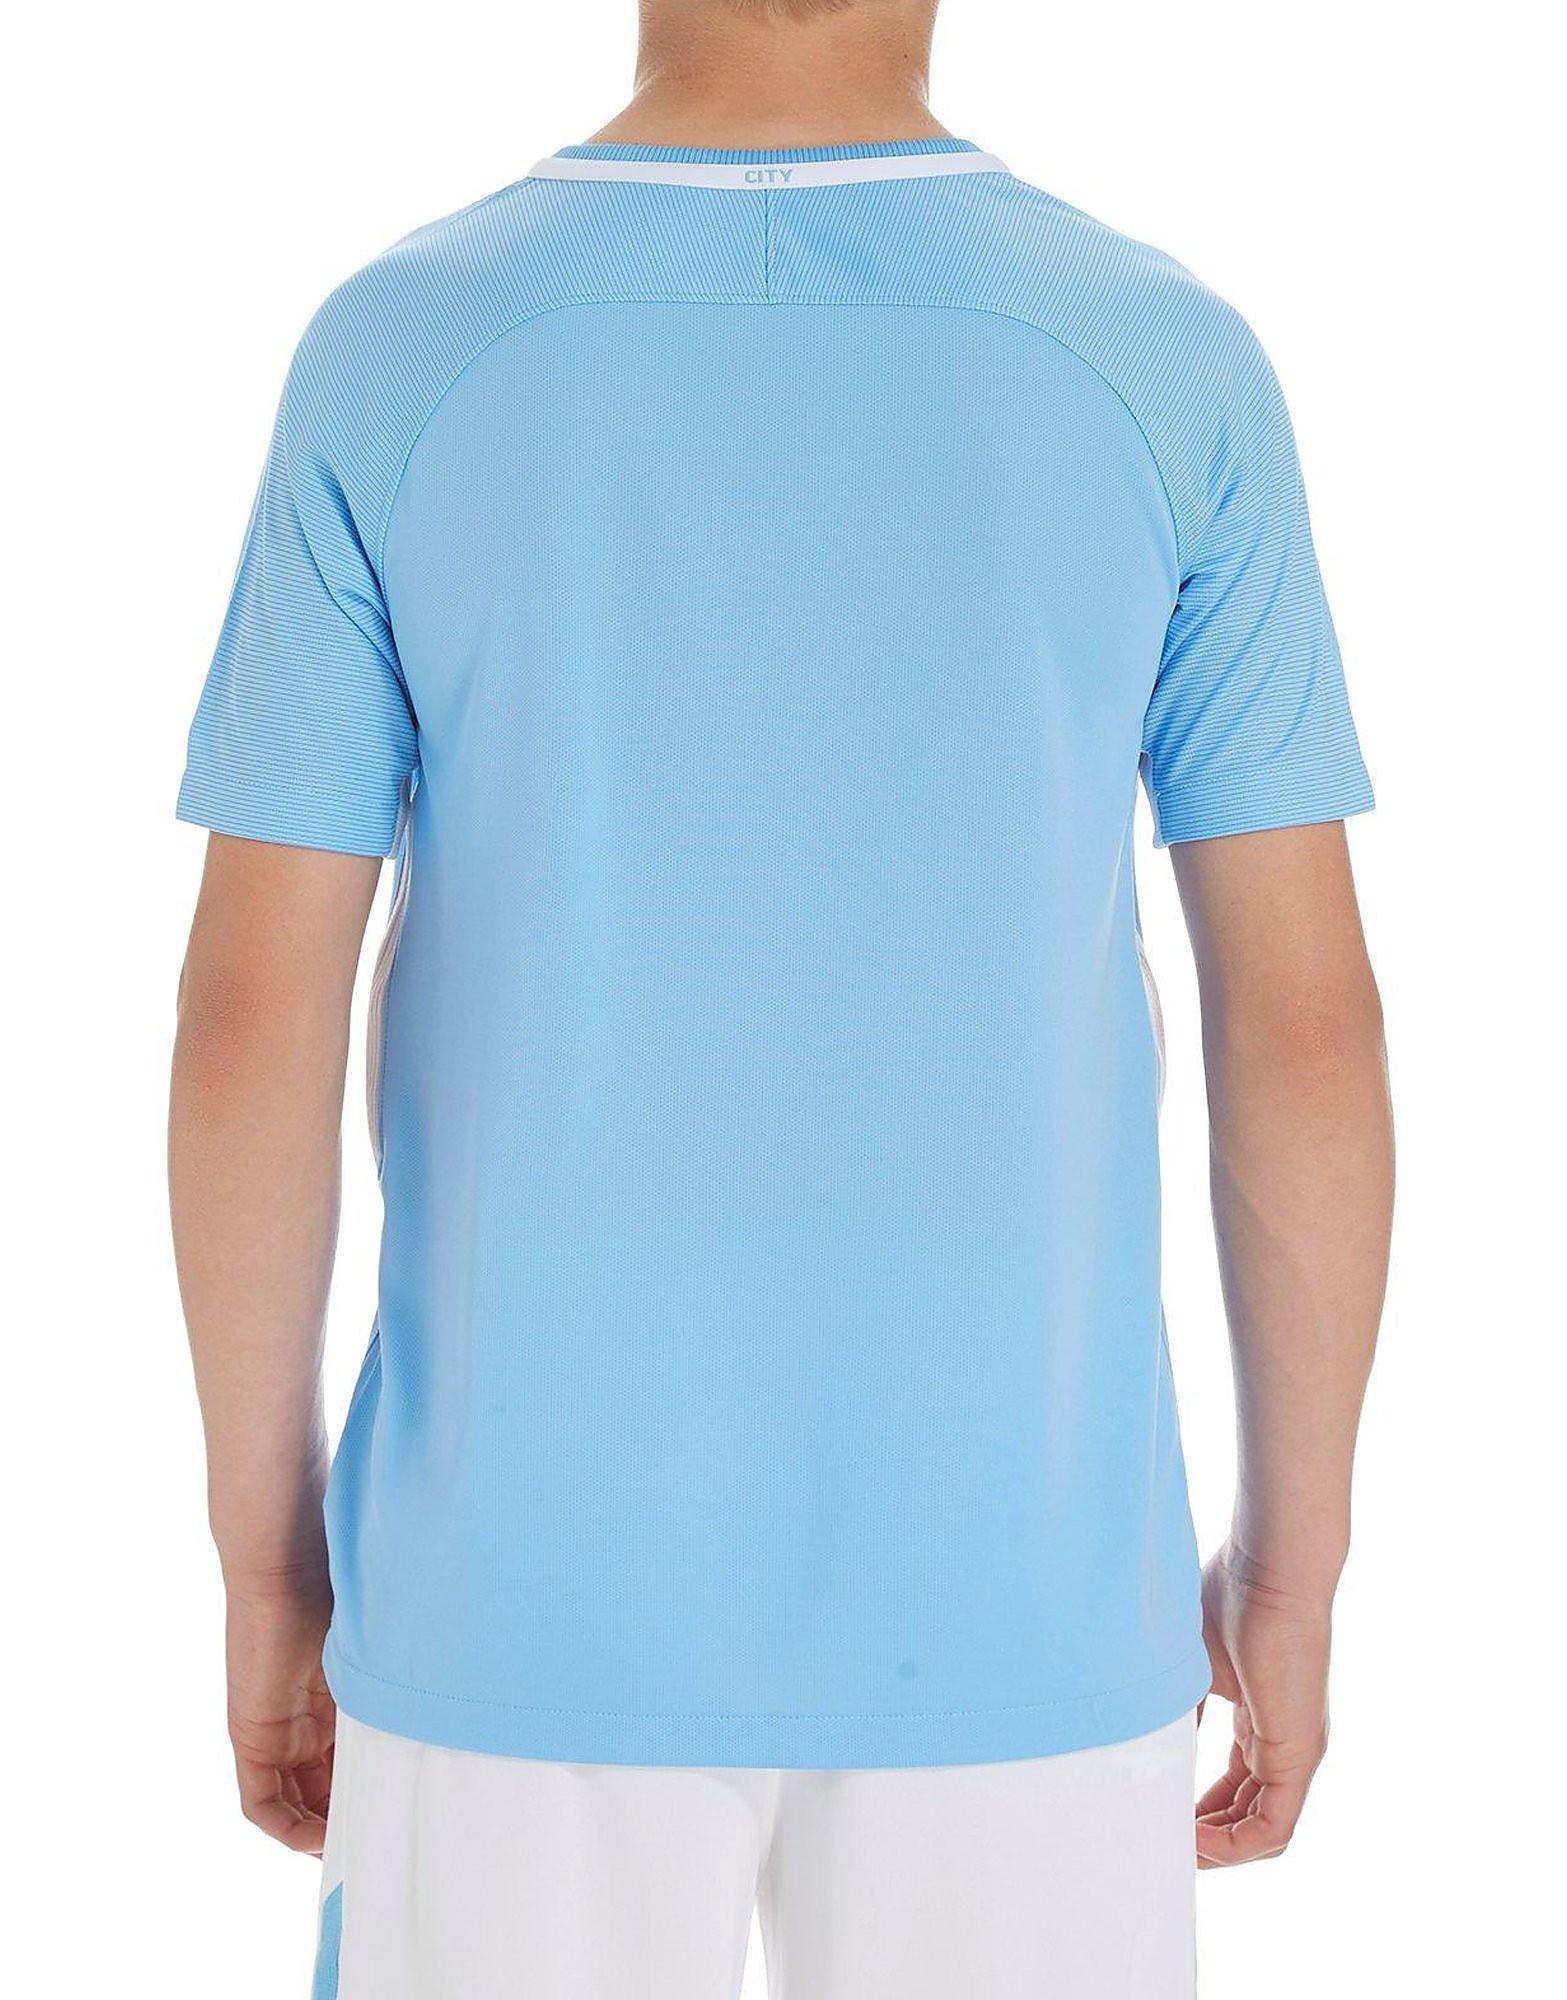 Nike Manchester City 2017/18 Home Shirt Jnr PRE ORDER